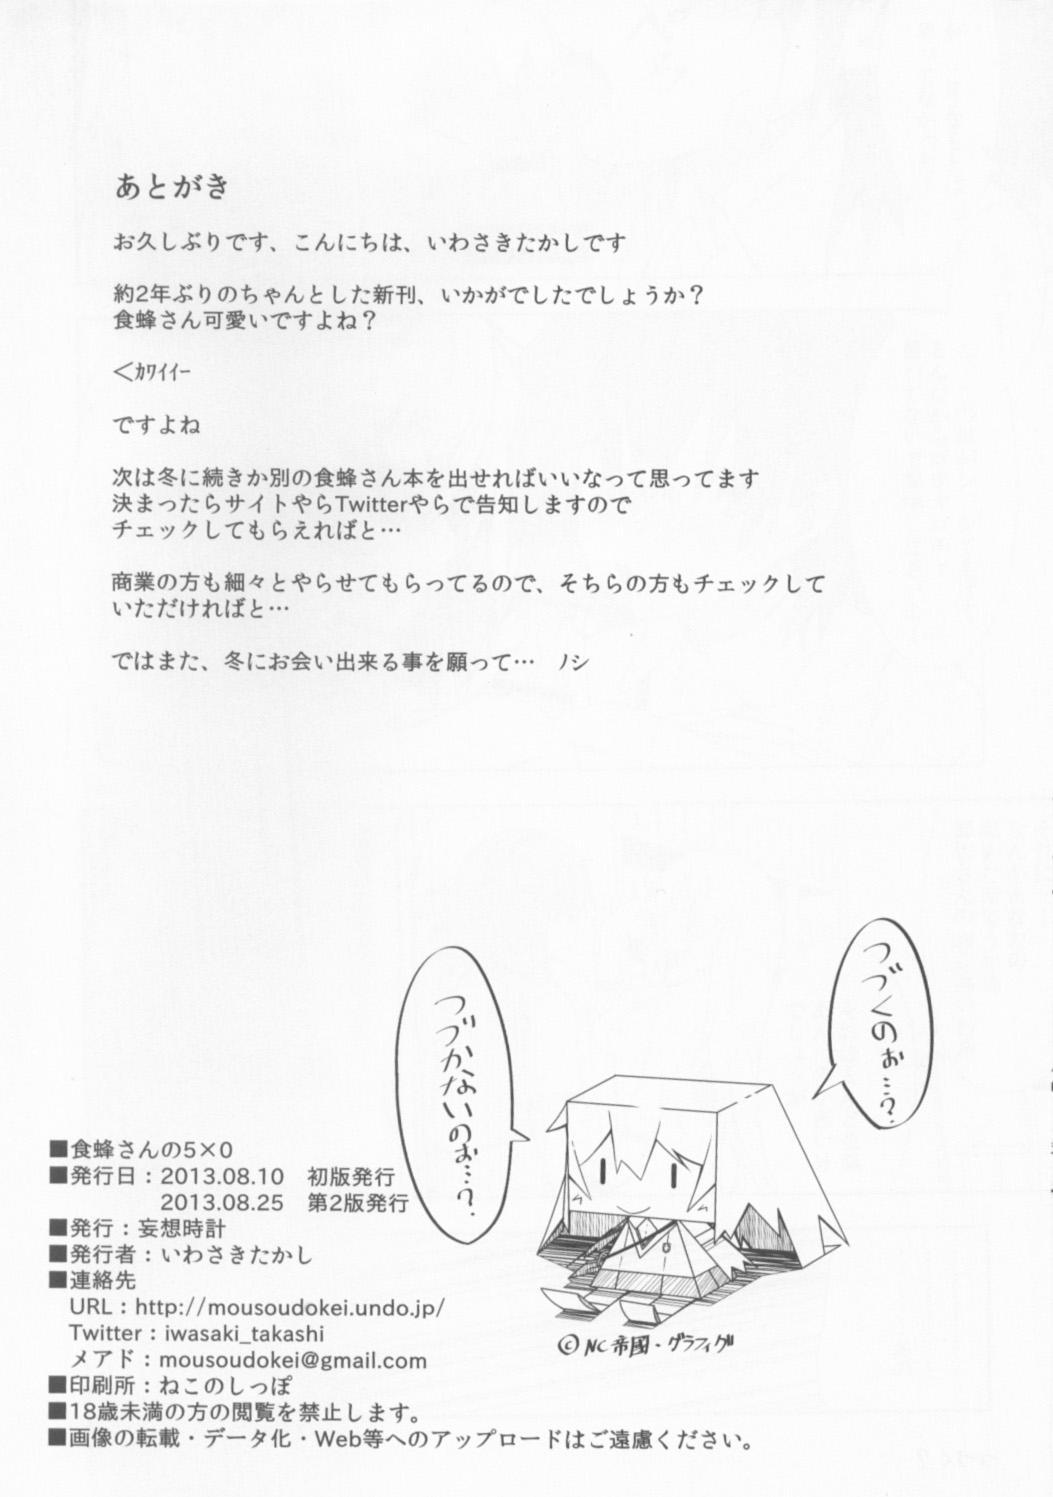 Shokuhou-san no 5x0 27